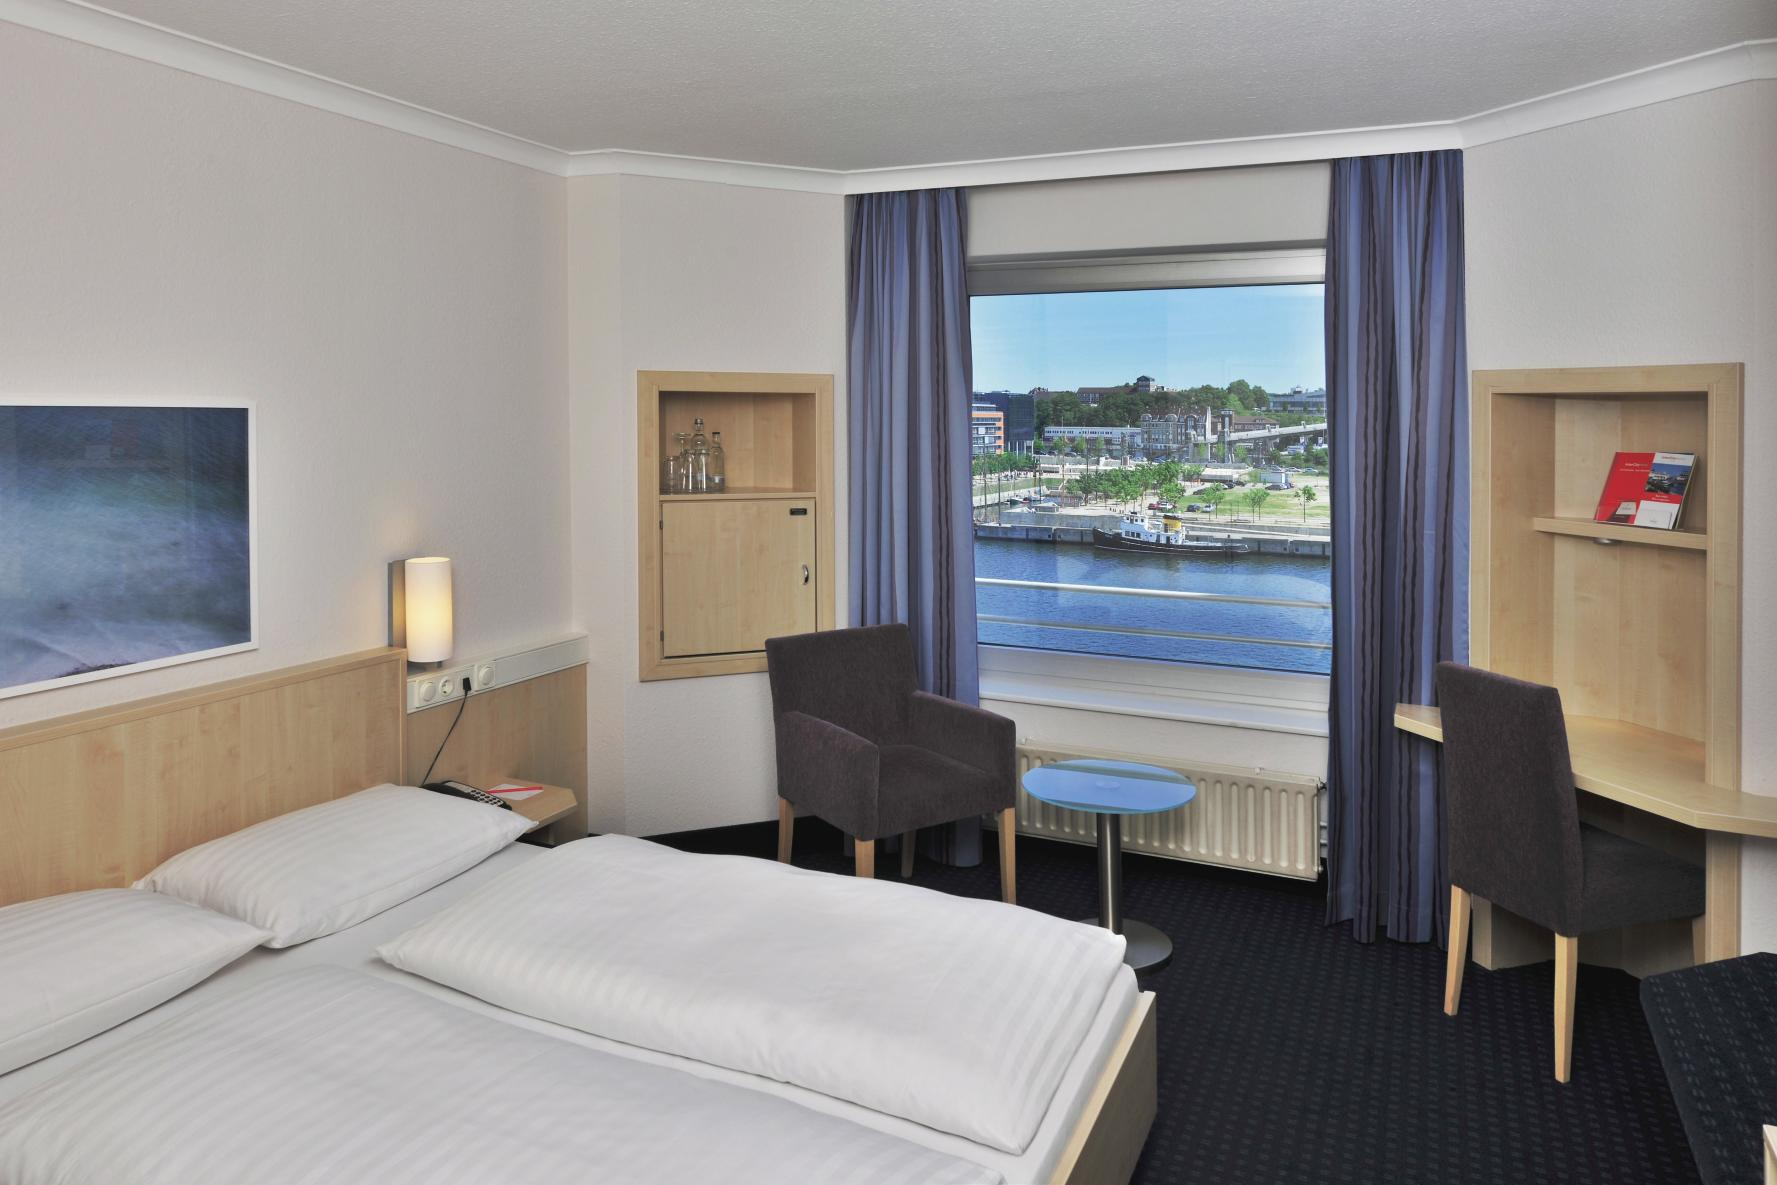 44565_ICH_Kiel_room_7